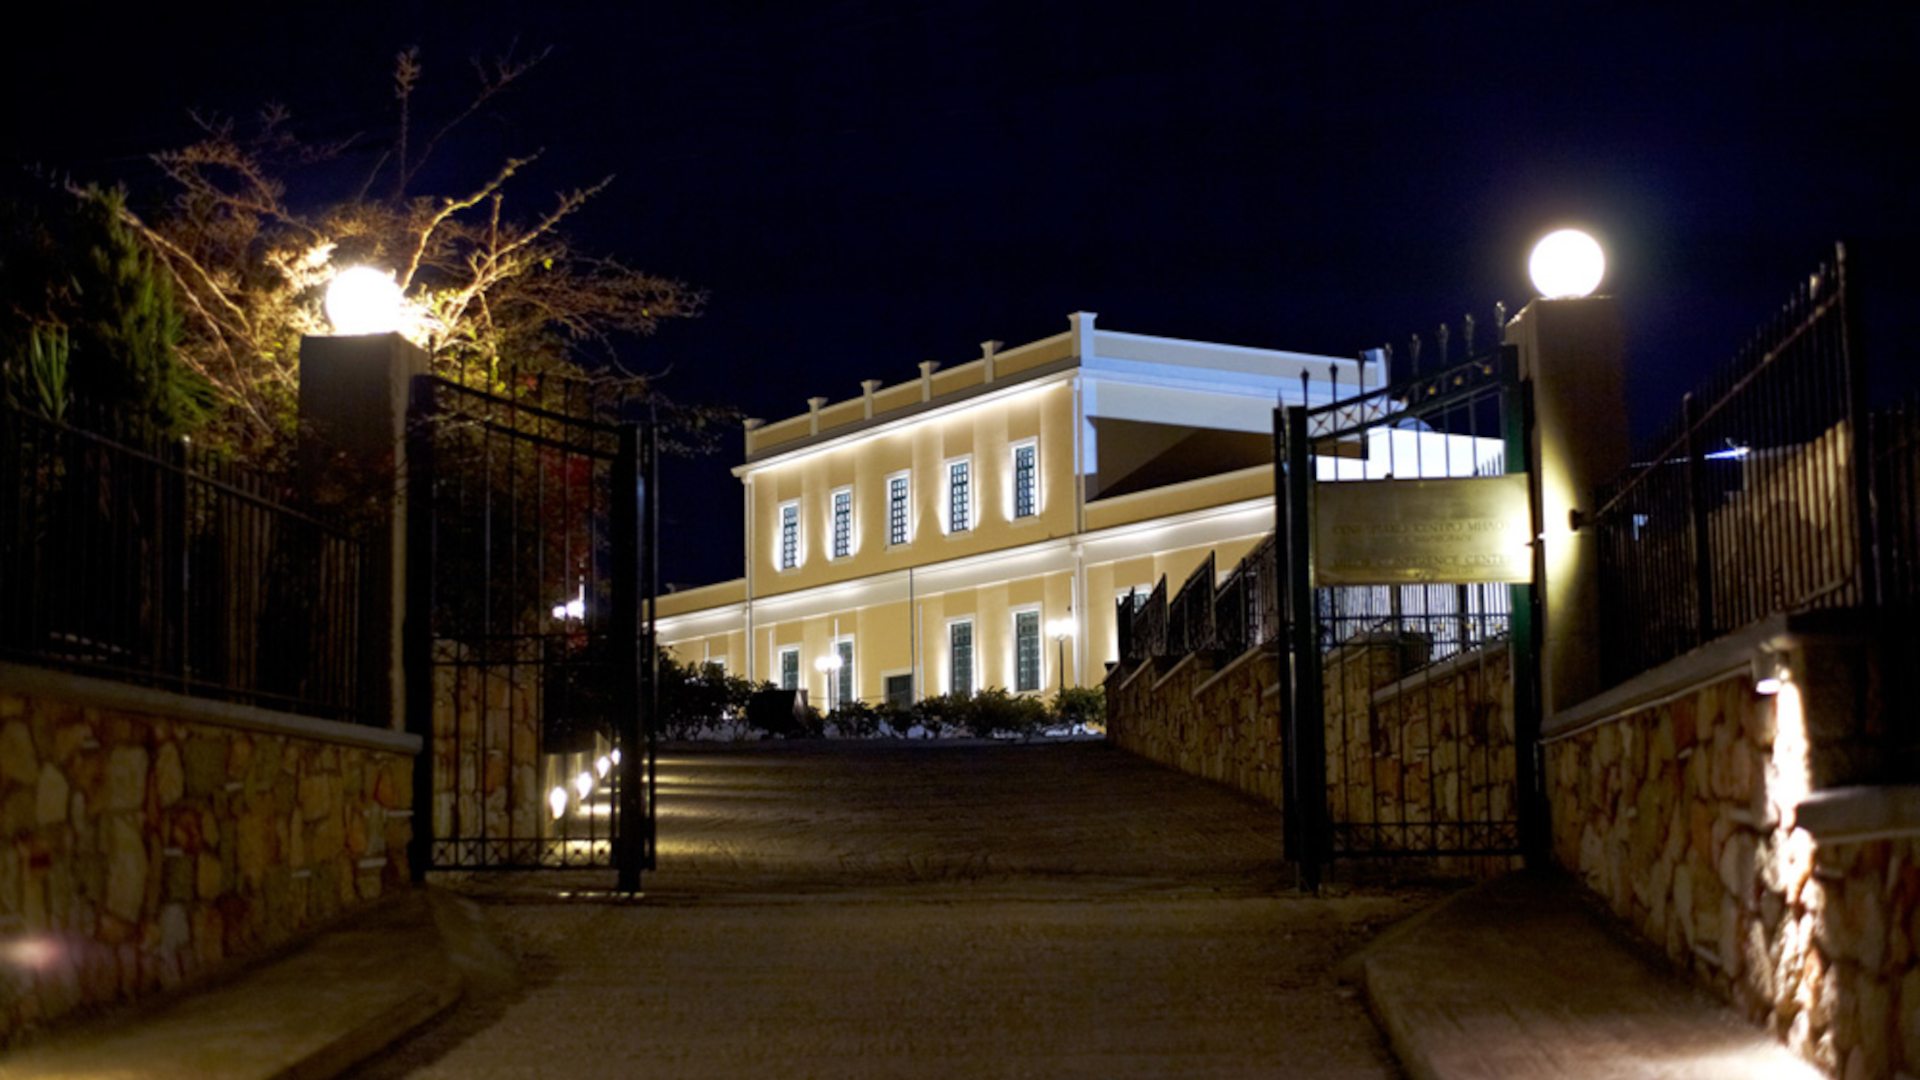 The Milos Conference Centre